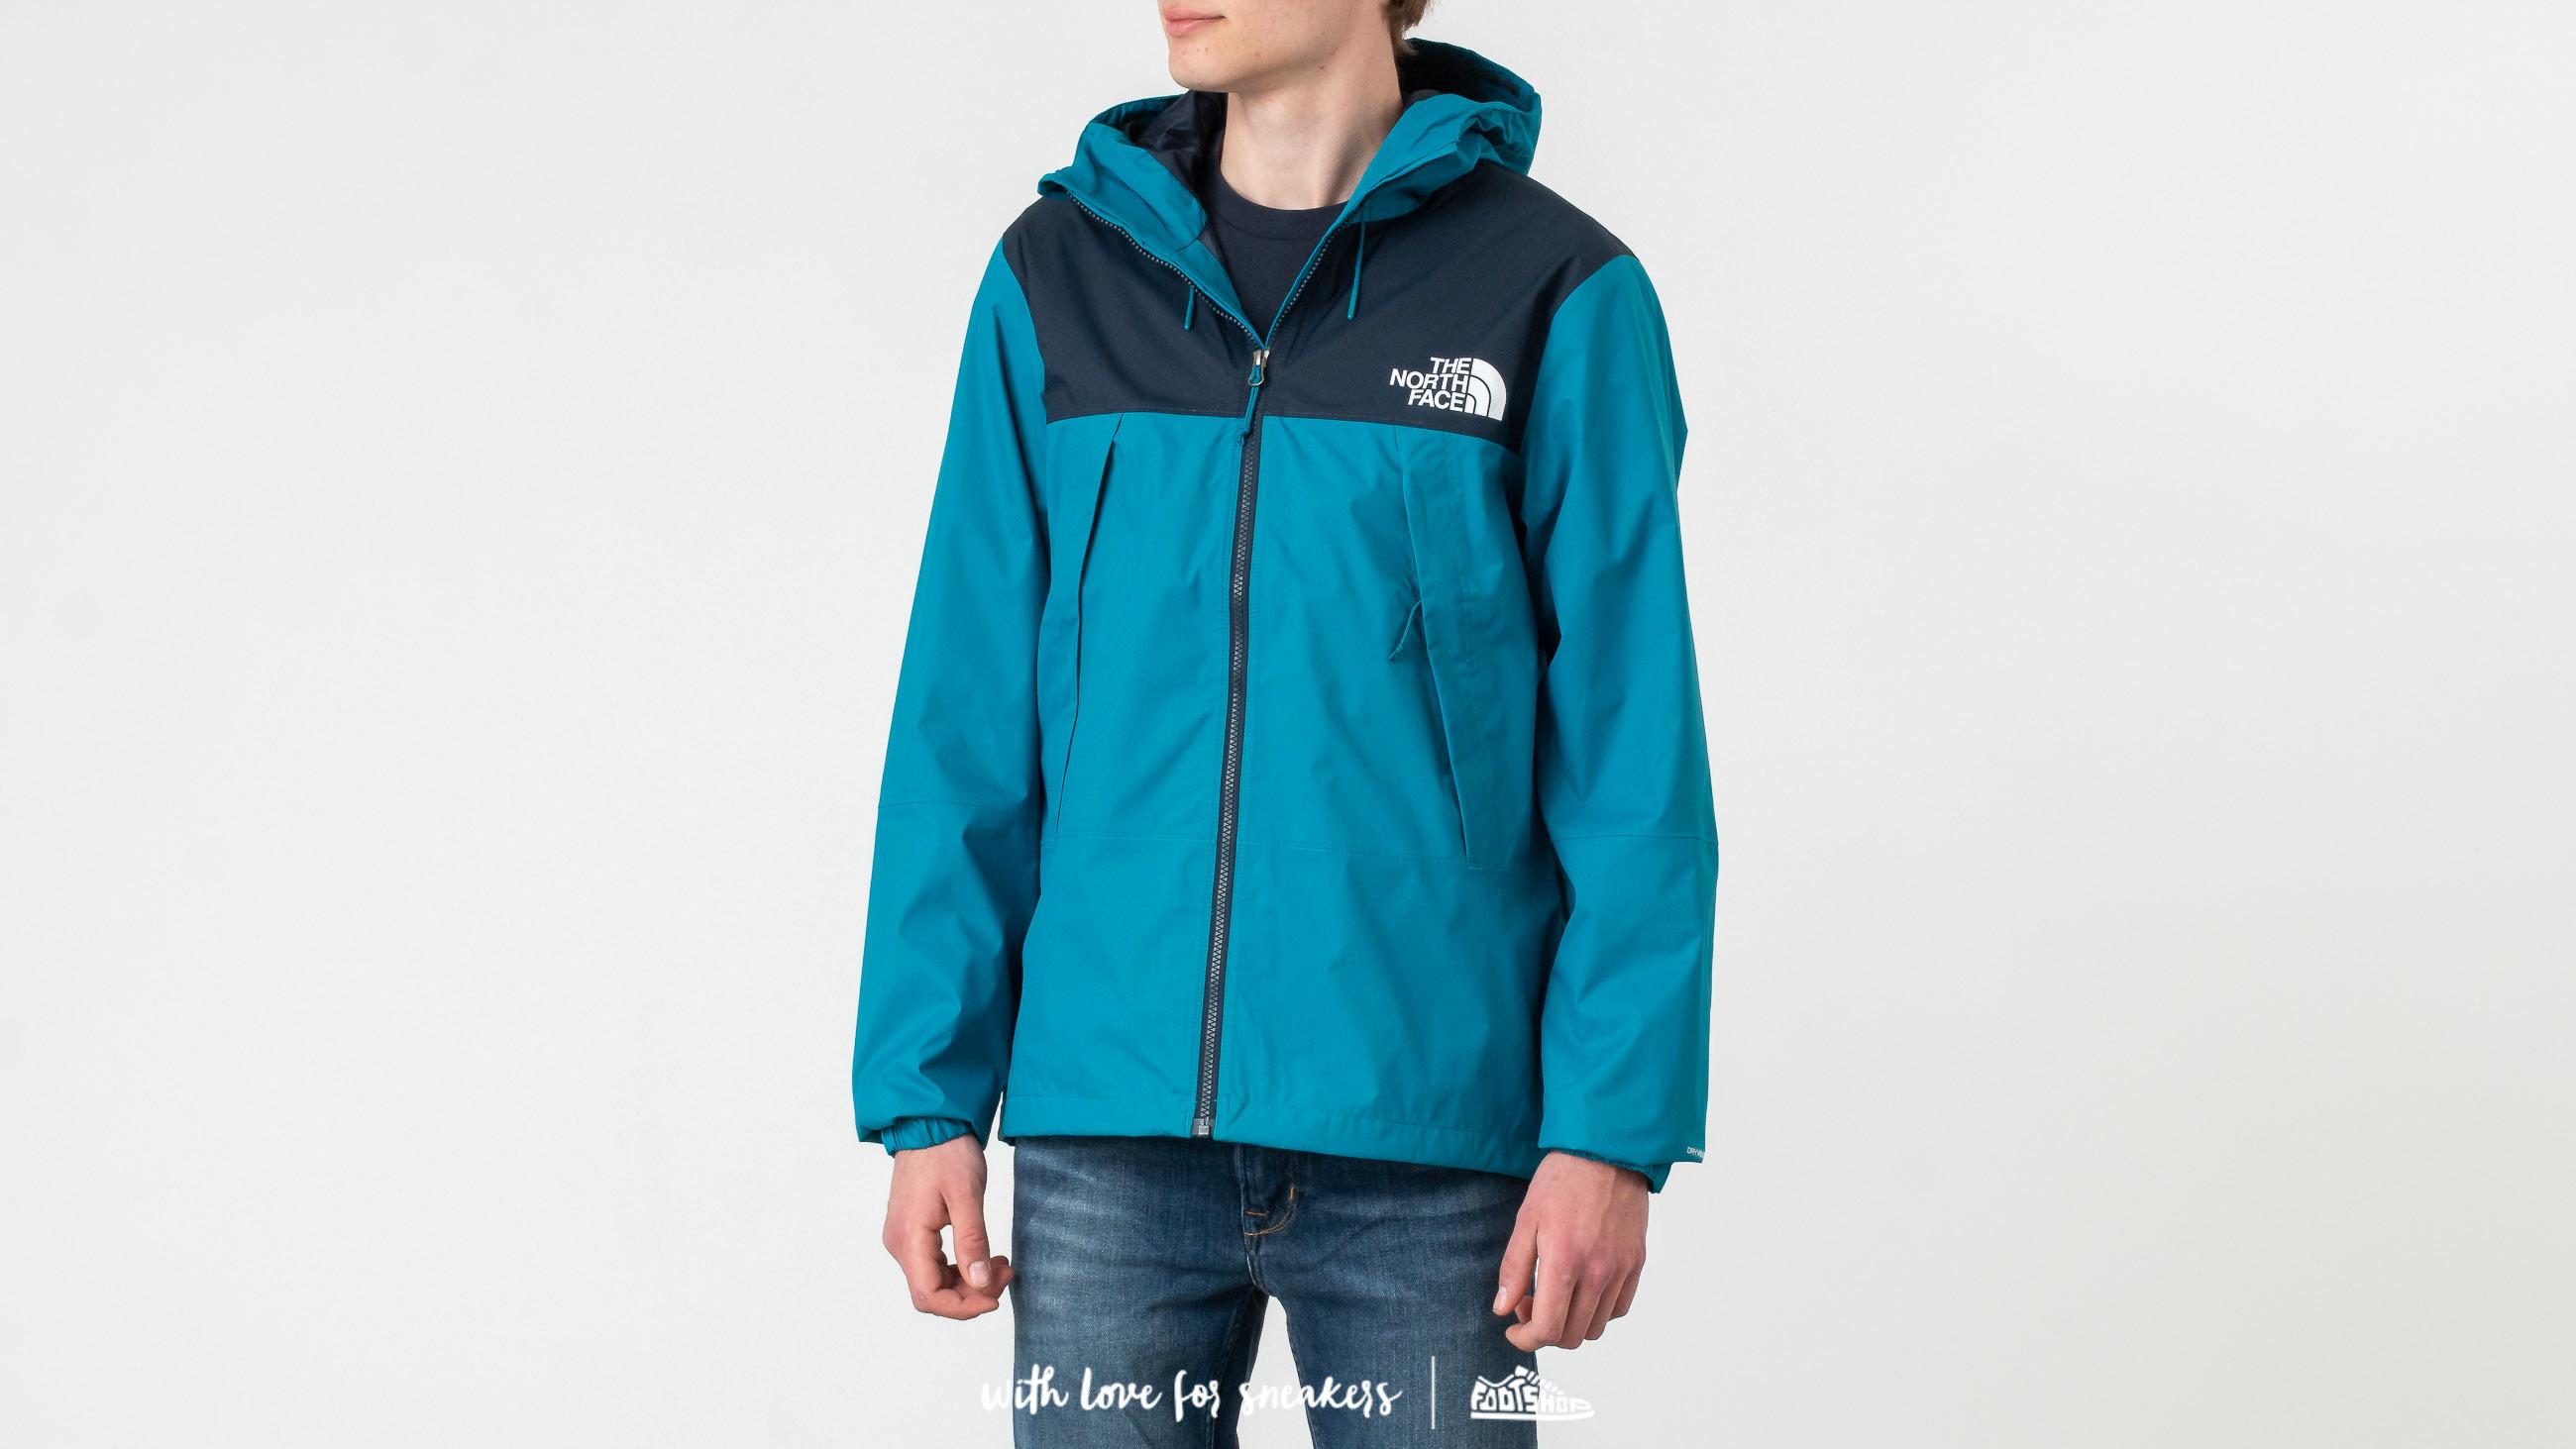 The North Face 1990 Mountain Jacket Crystal Teal za skvelú cenu 139 € kúpite na Footshop.sk